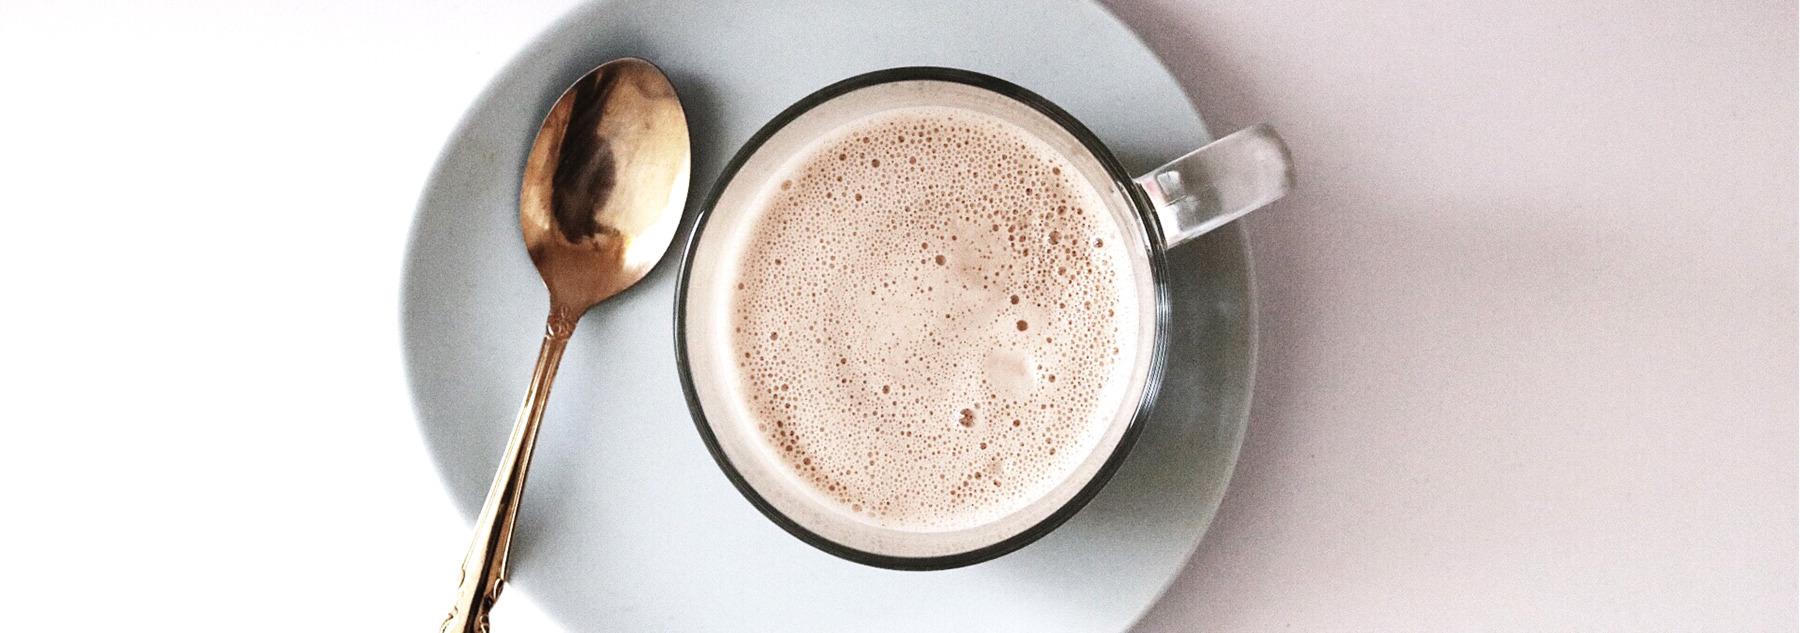 Vitality Latte Recipe with Shatavari and Ghee